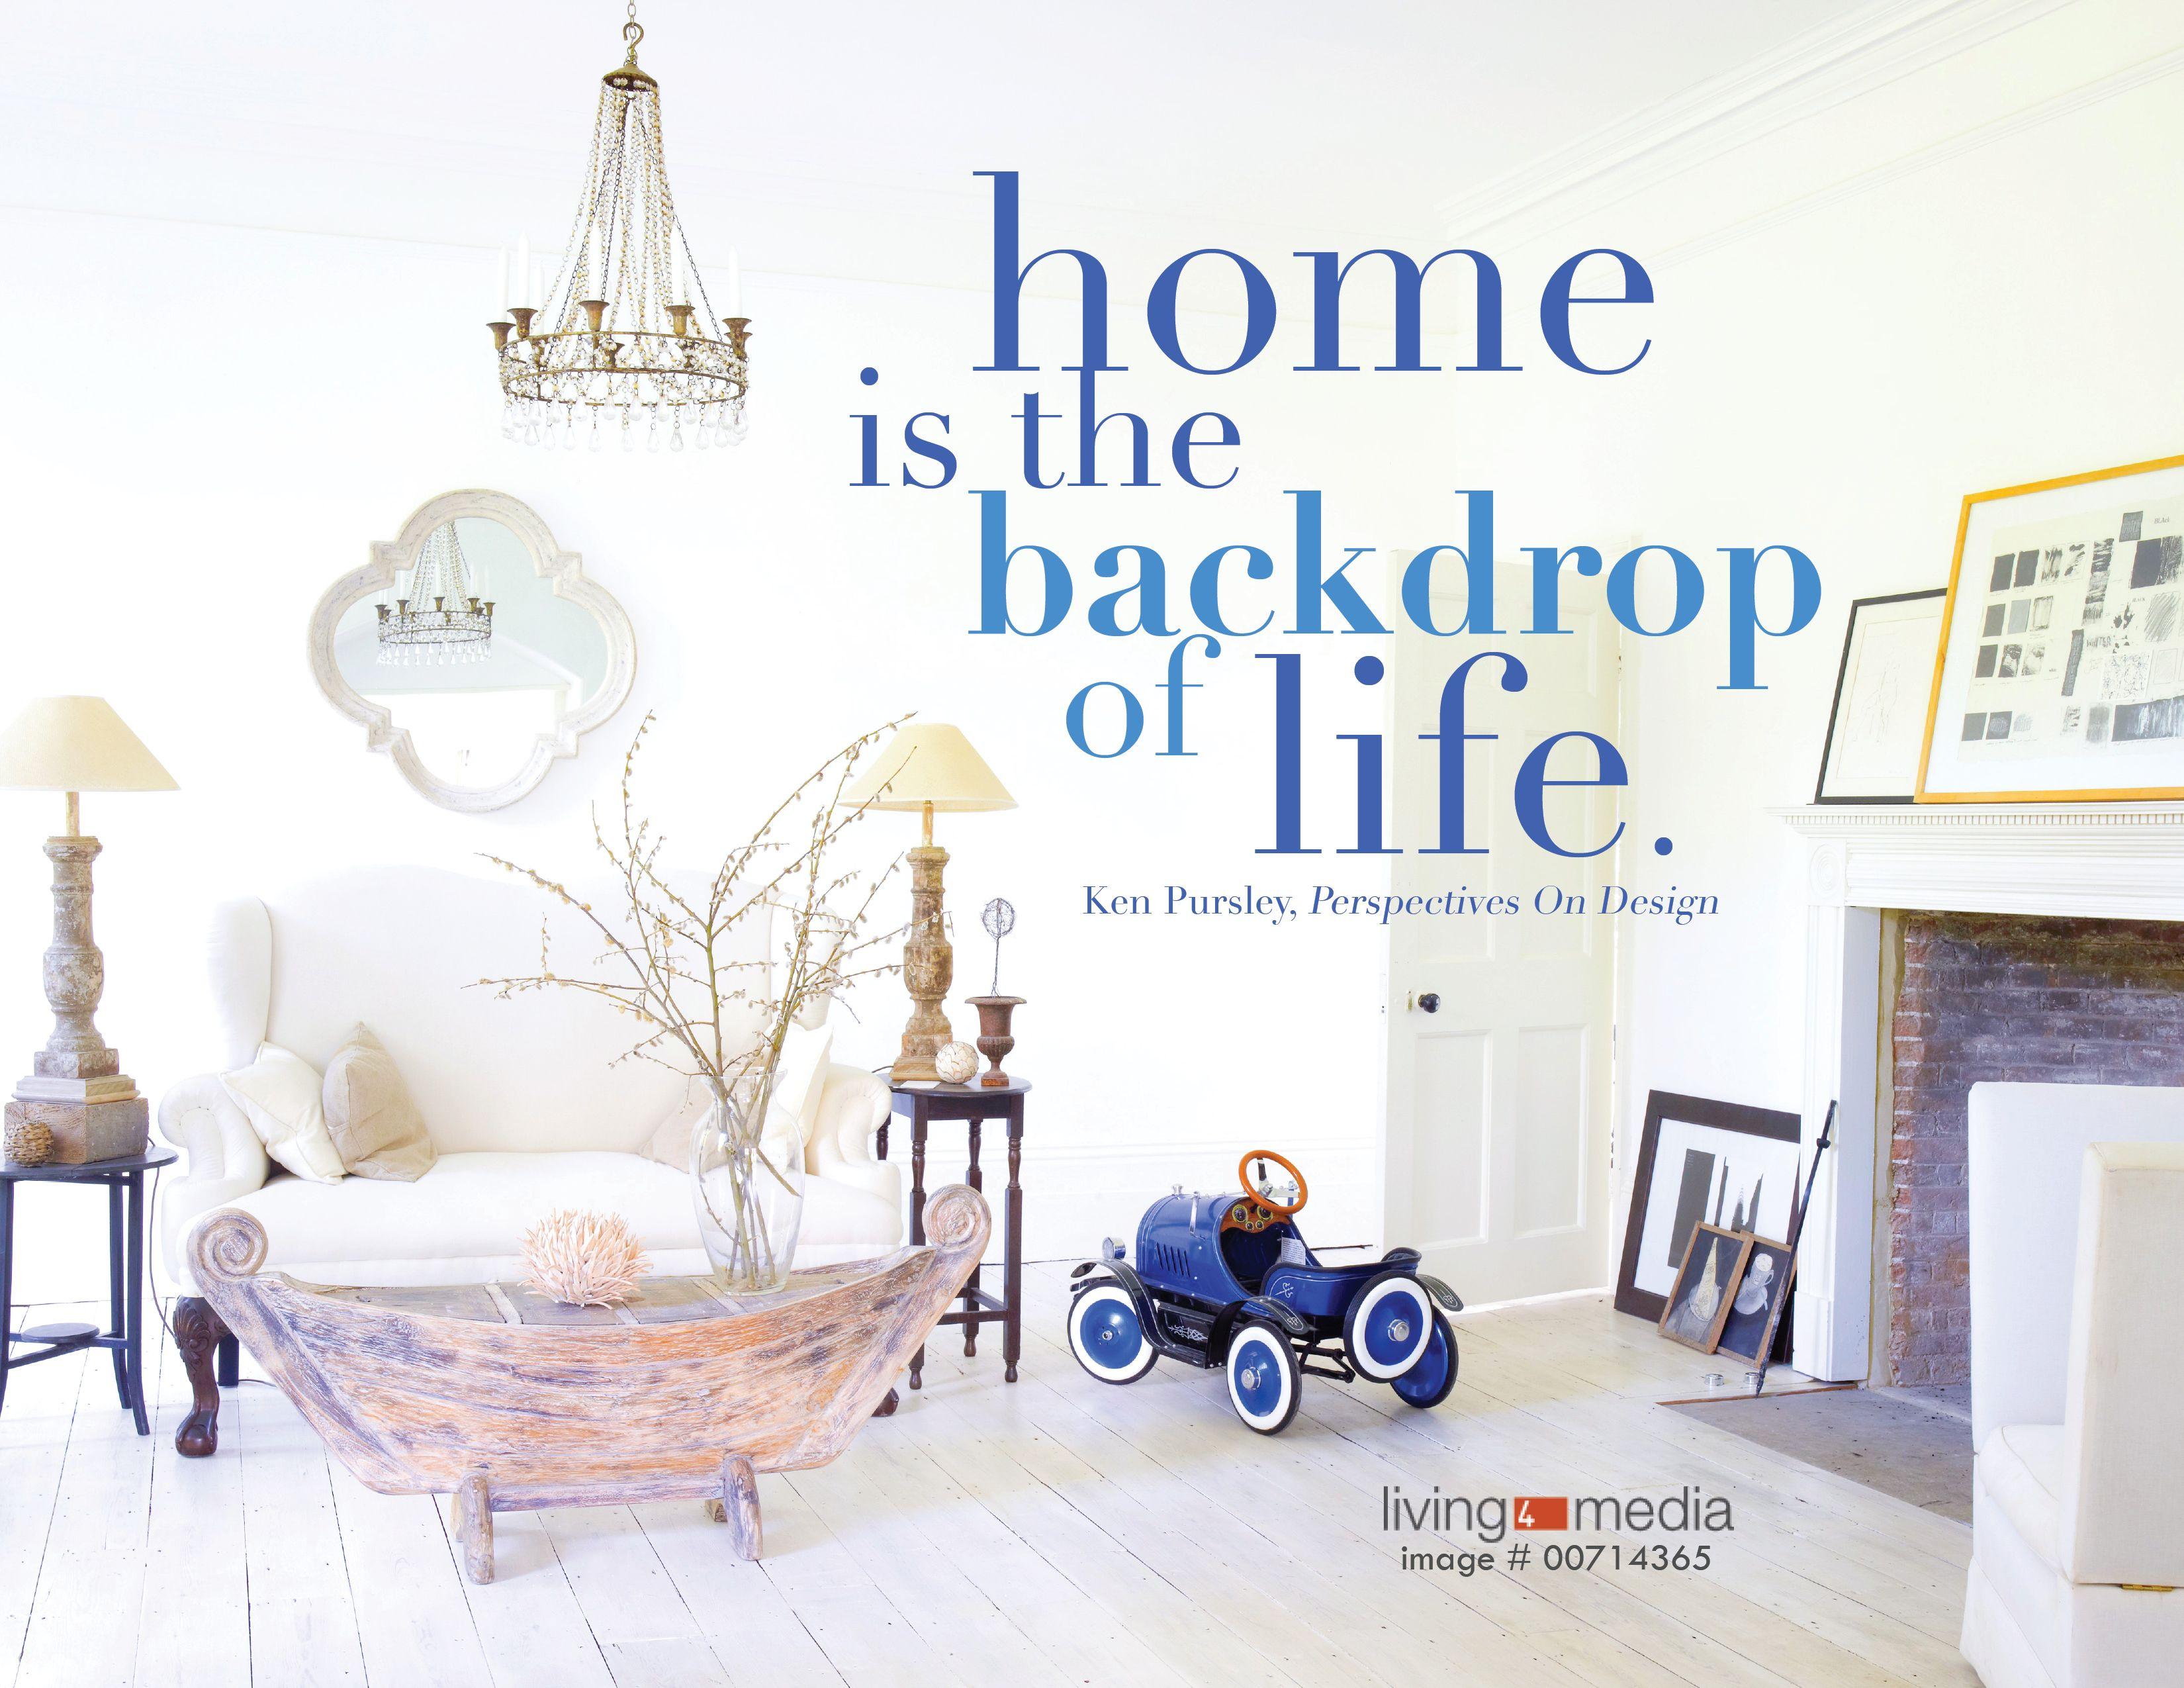 Home Interior Design Quotes - Home is the backdrop of life ken pursley designer quoteshotel interiorsdesign